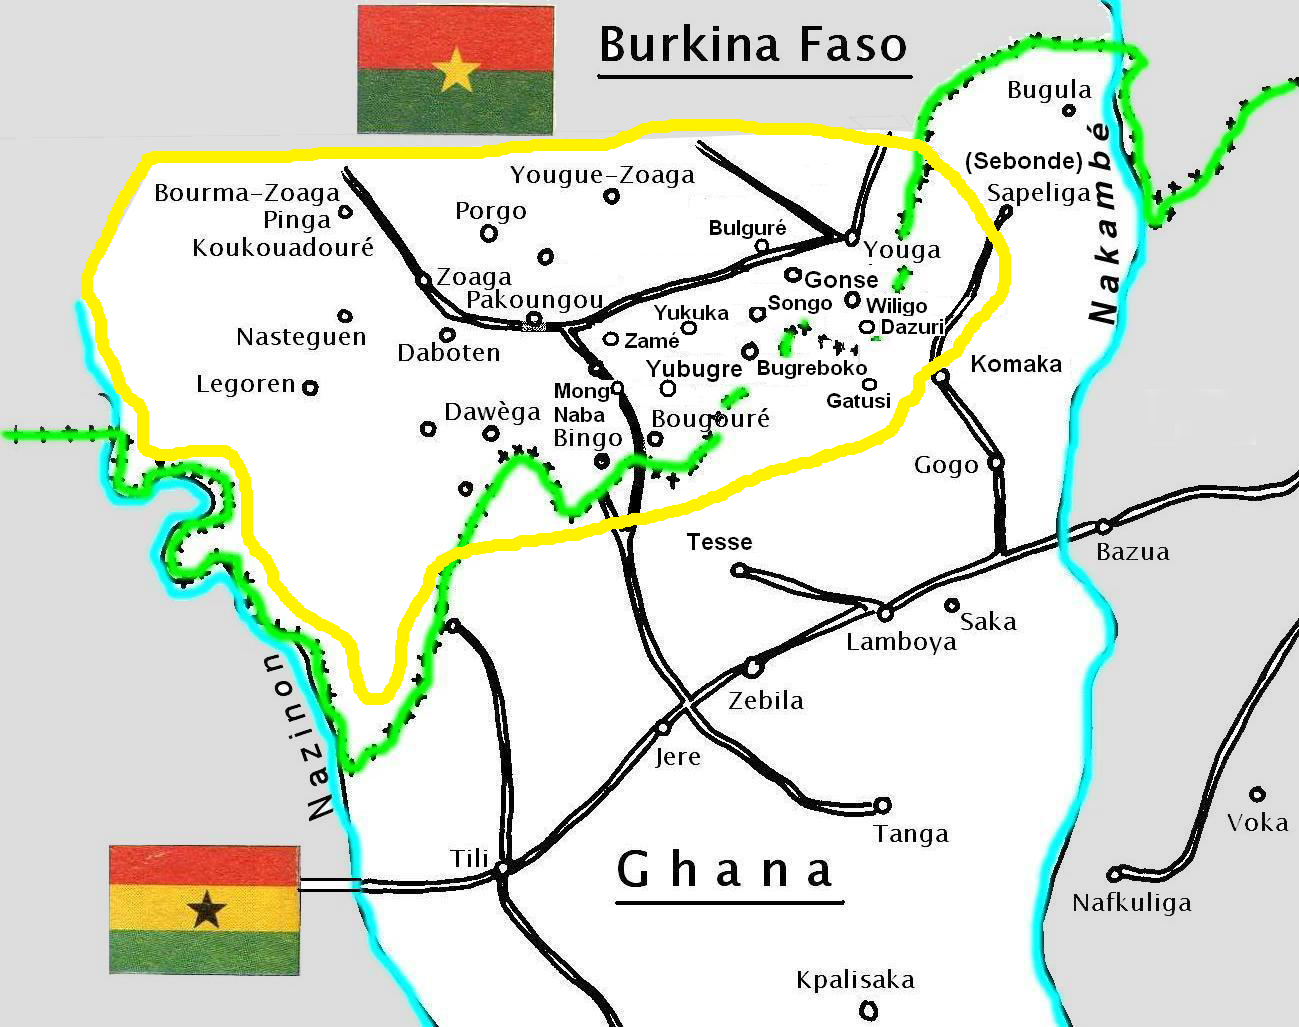 Villes et villages kusaasi au Burkina Faso. Kusaal towns and villages in Burkina Faso.